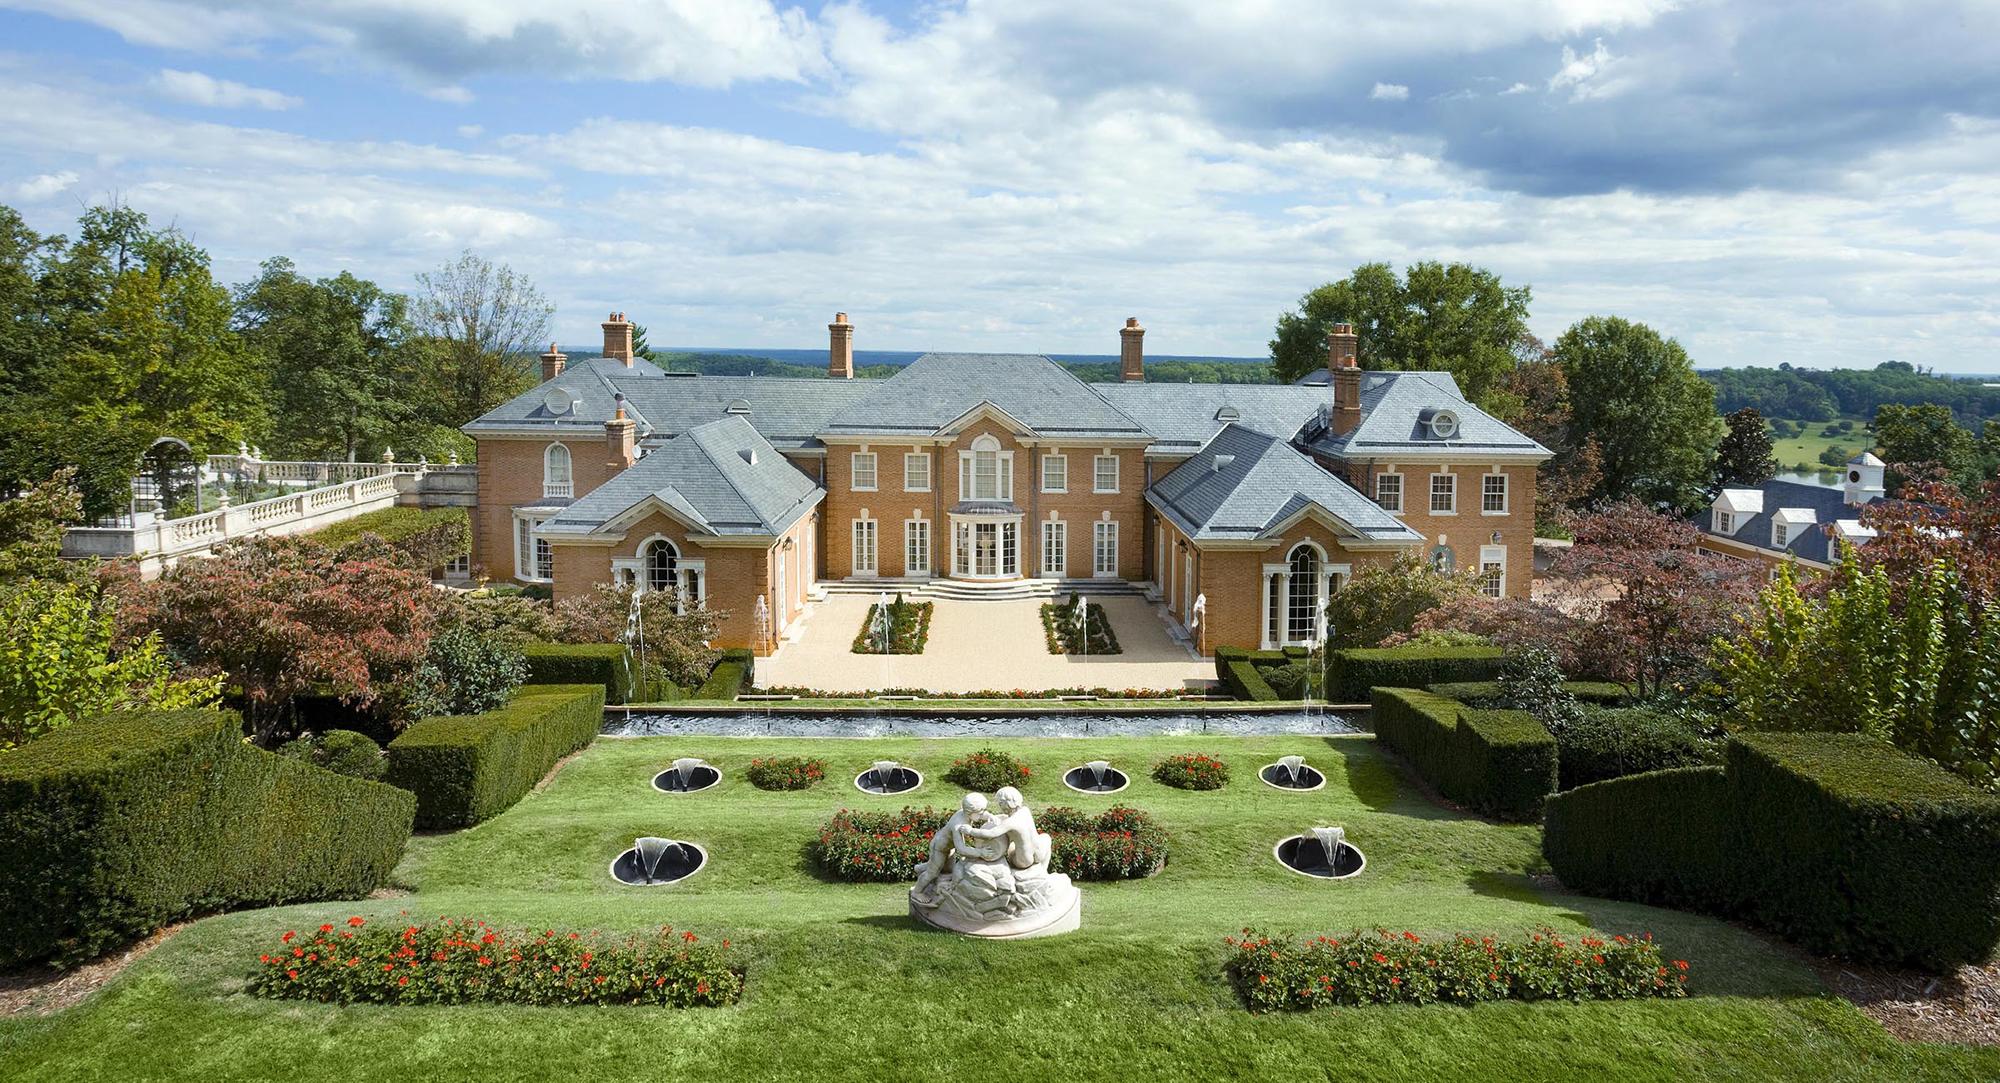 Finca y bodega Kluge (Charlottesville) – Valor: 80 millones de euros